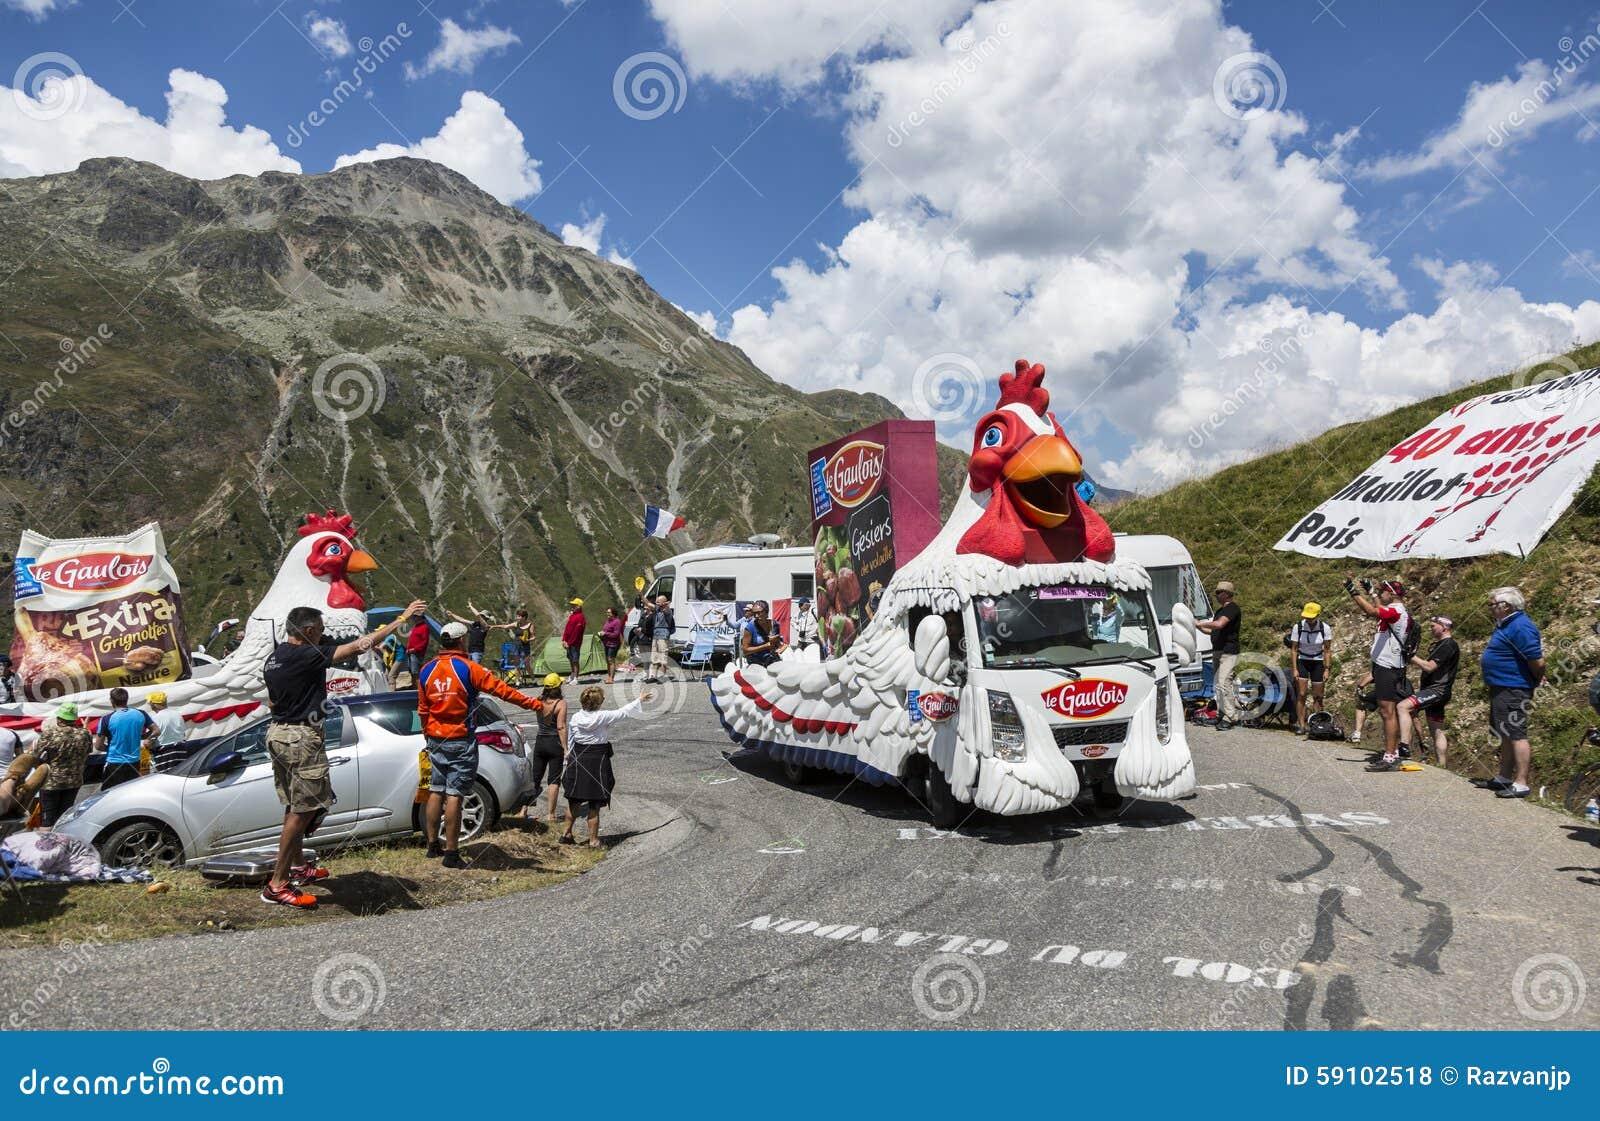 Le Gaulois Caravan -环法自行车赛2015年